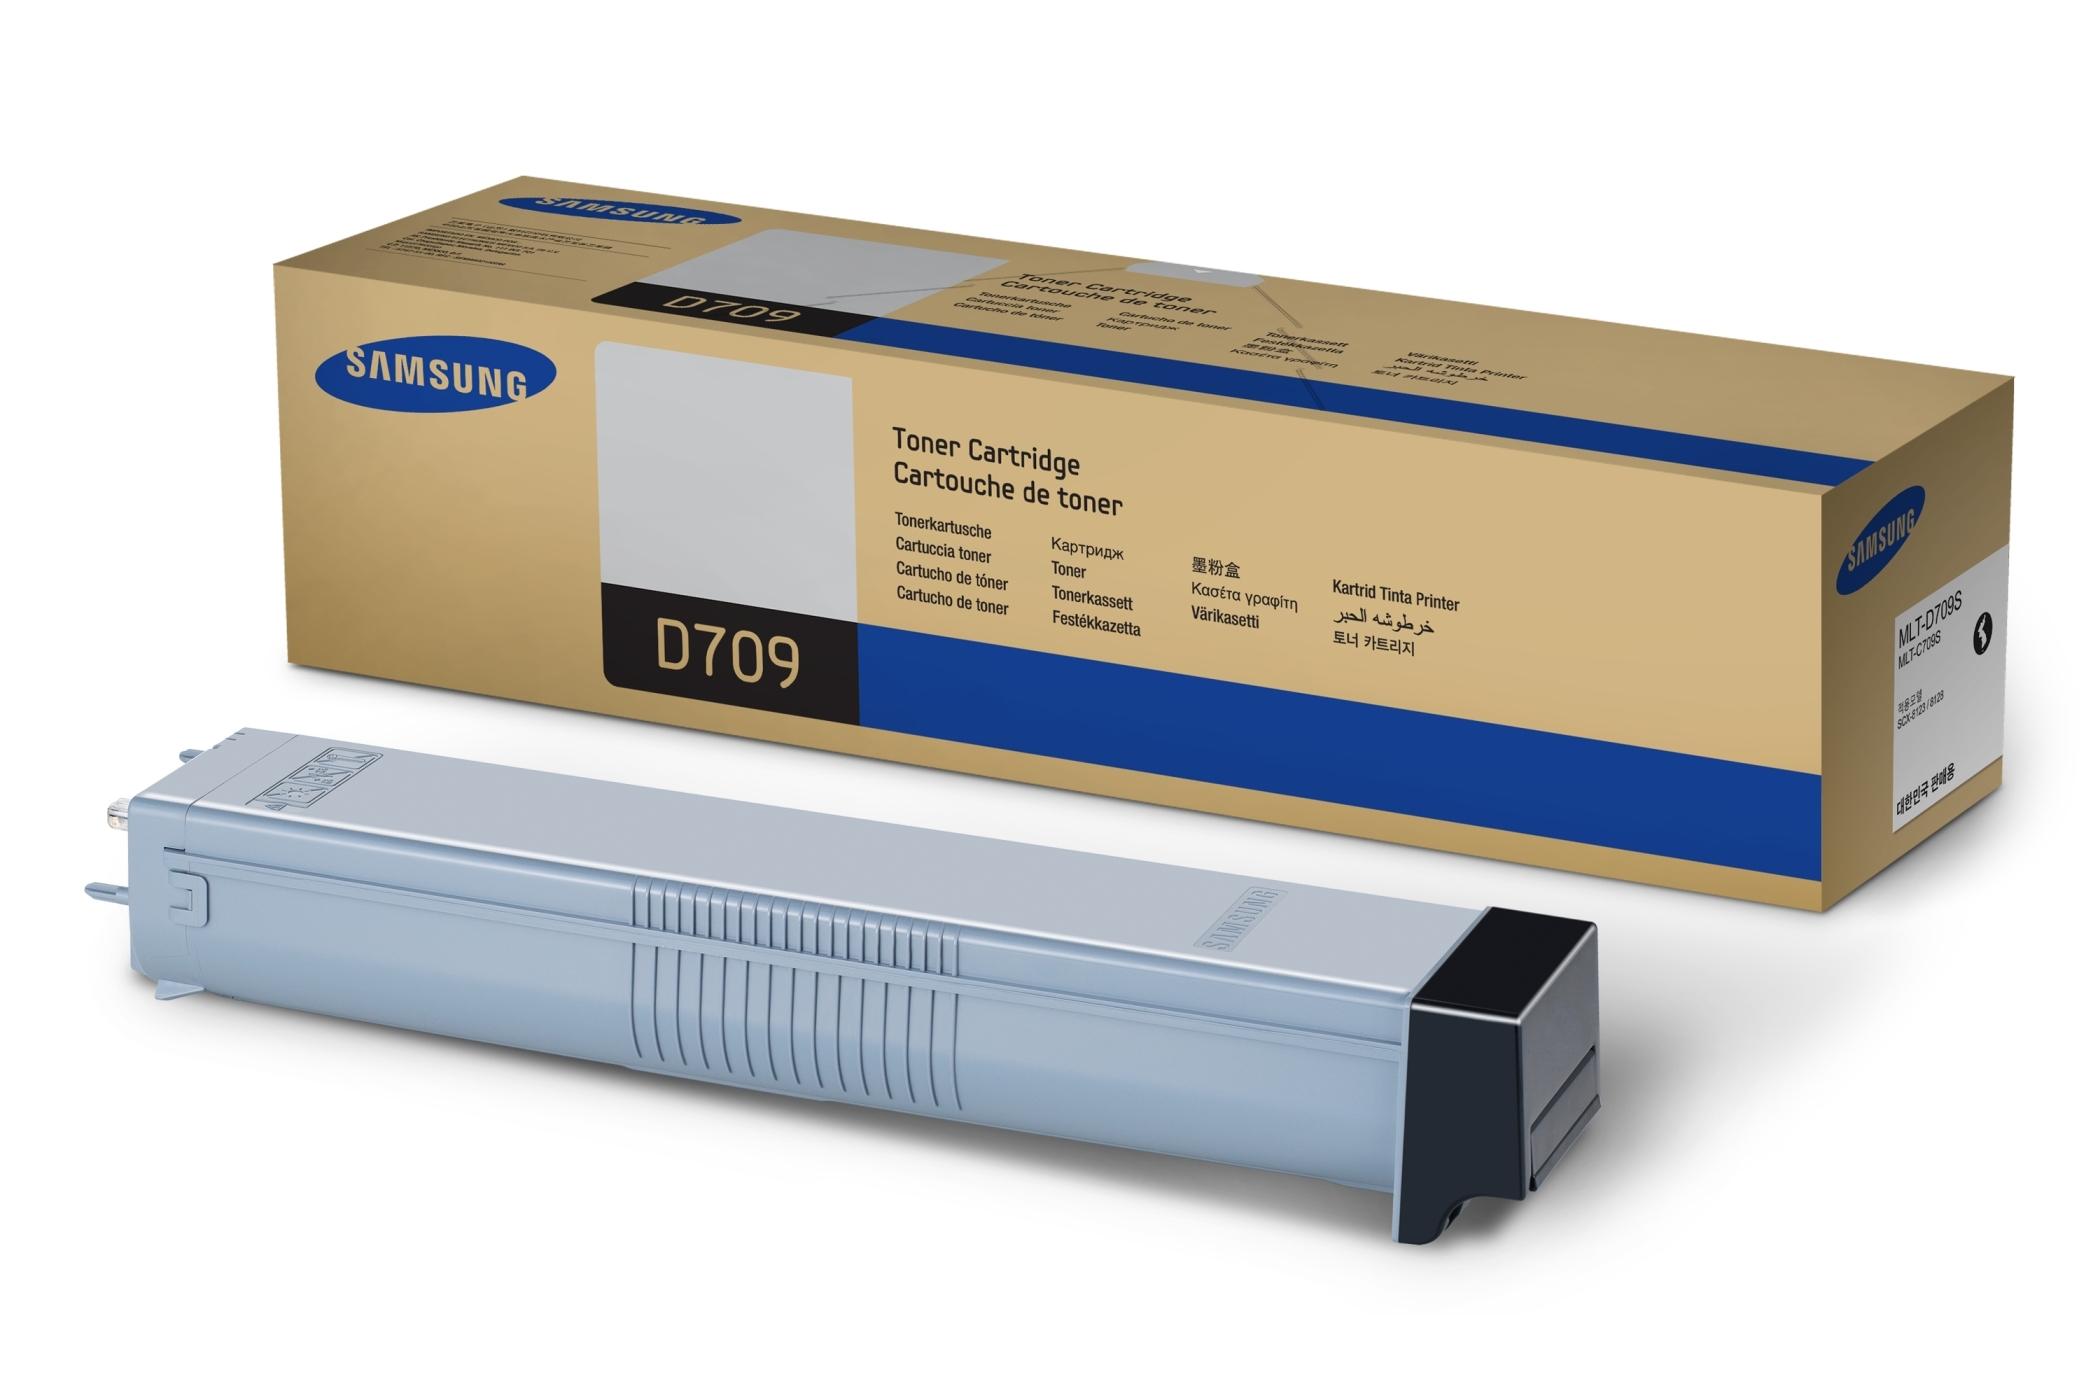 Тонер-картридж Samsung MLT-D709S